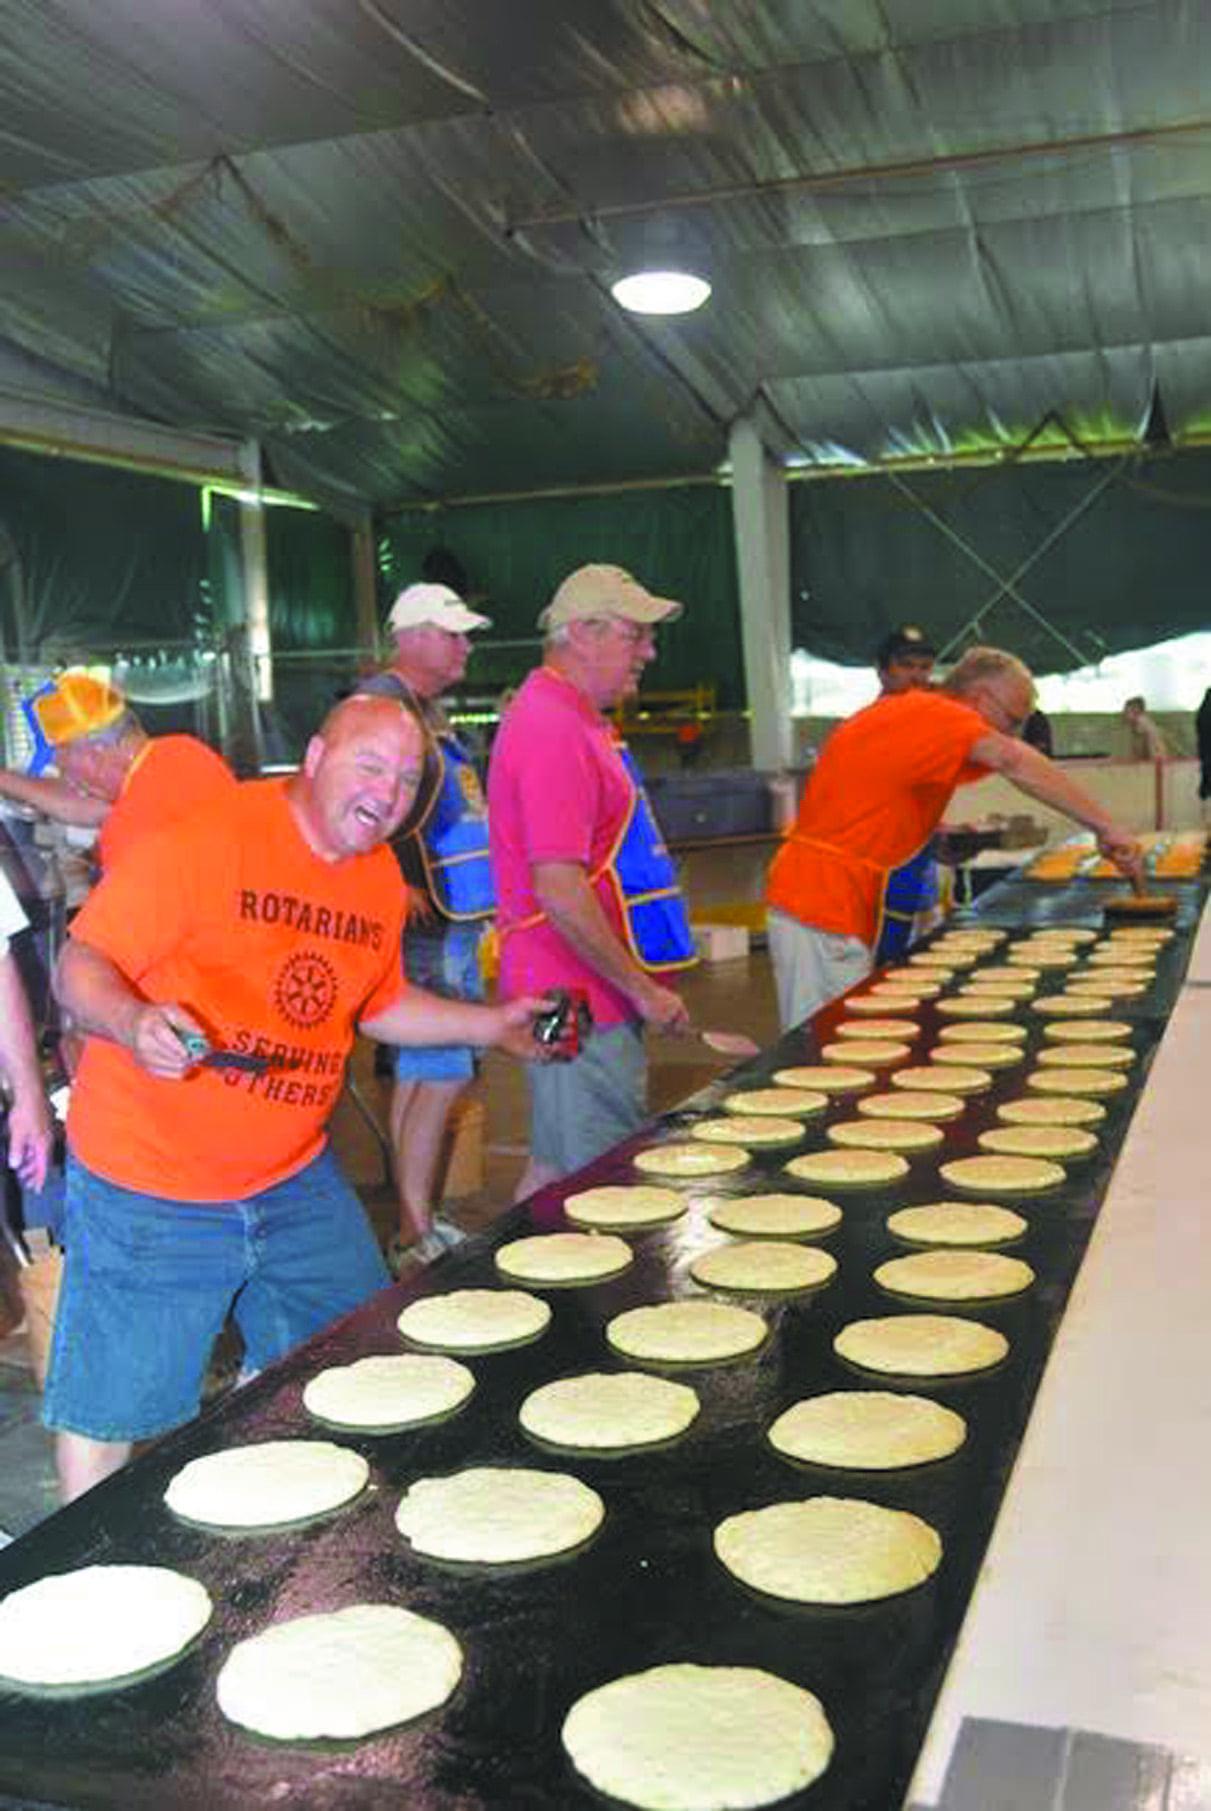 Rotary Father's Day pancake breakfast Sunday